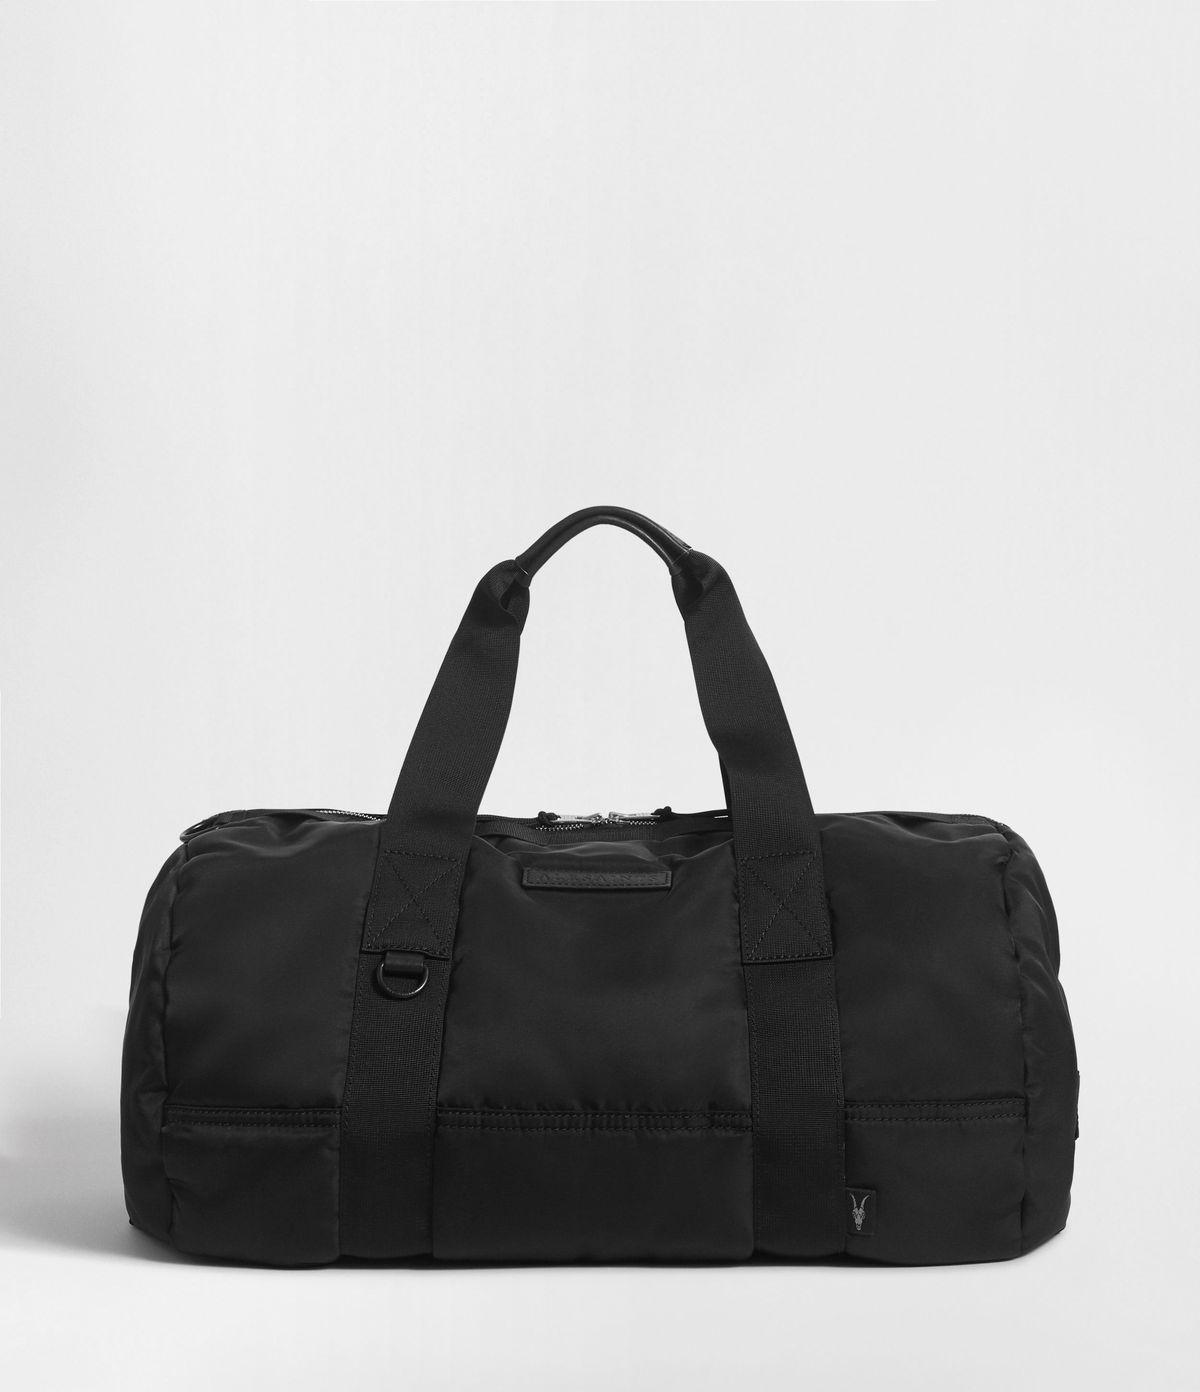 105da49fc13b Lyst - AllSaints Kansai Gym Bag in Black for Men